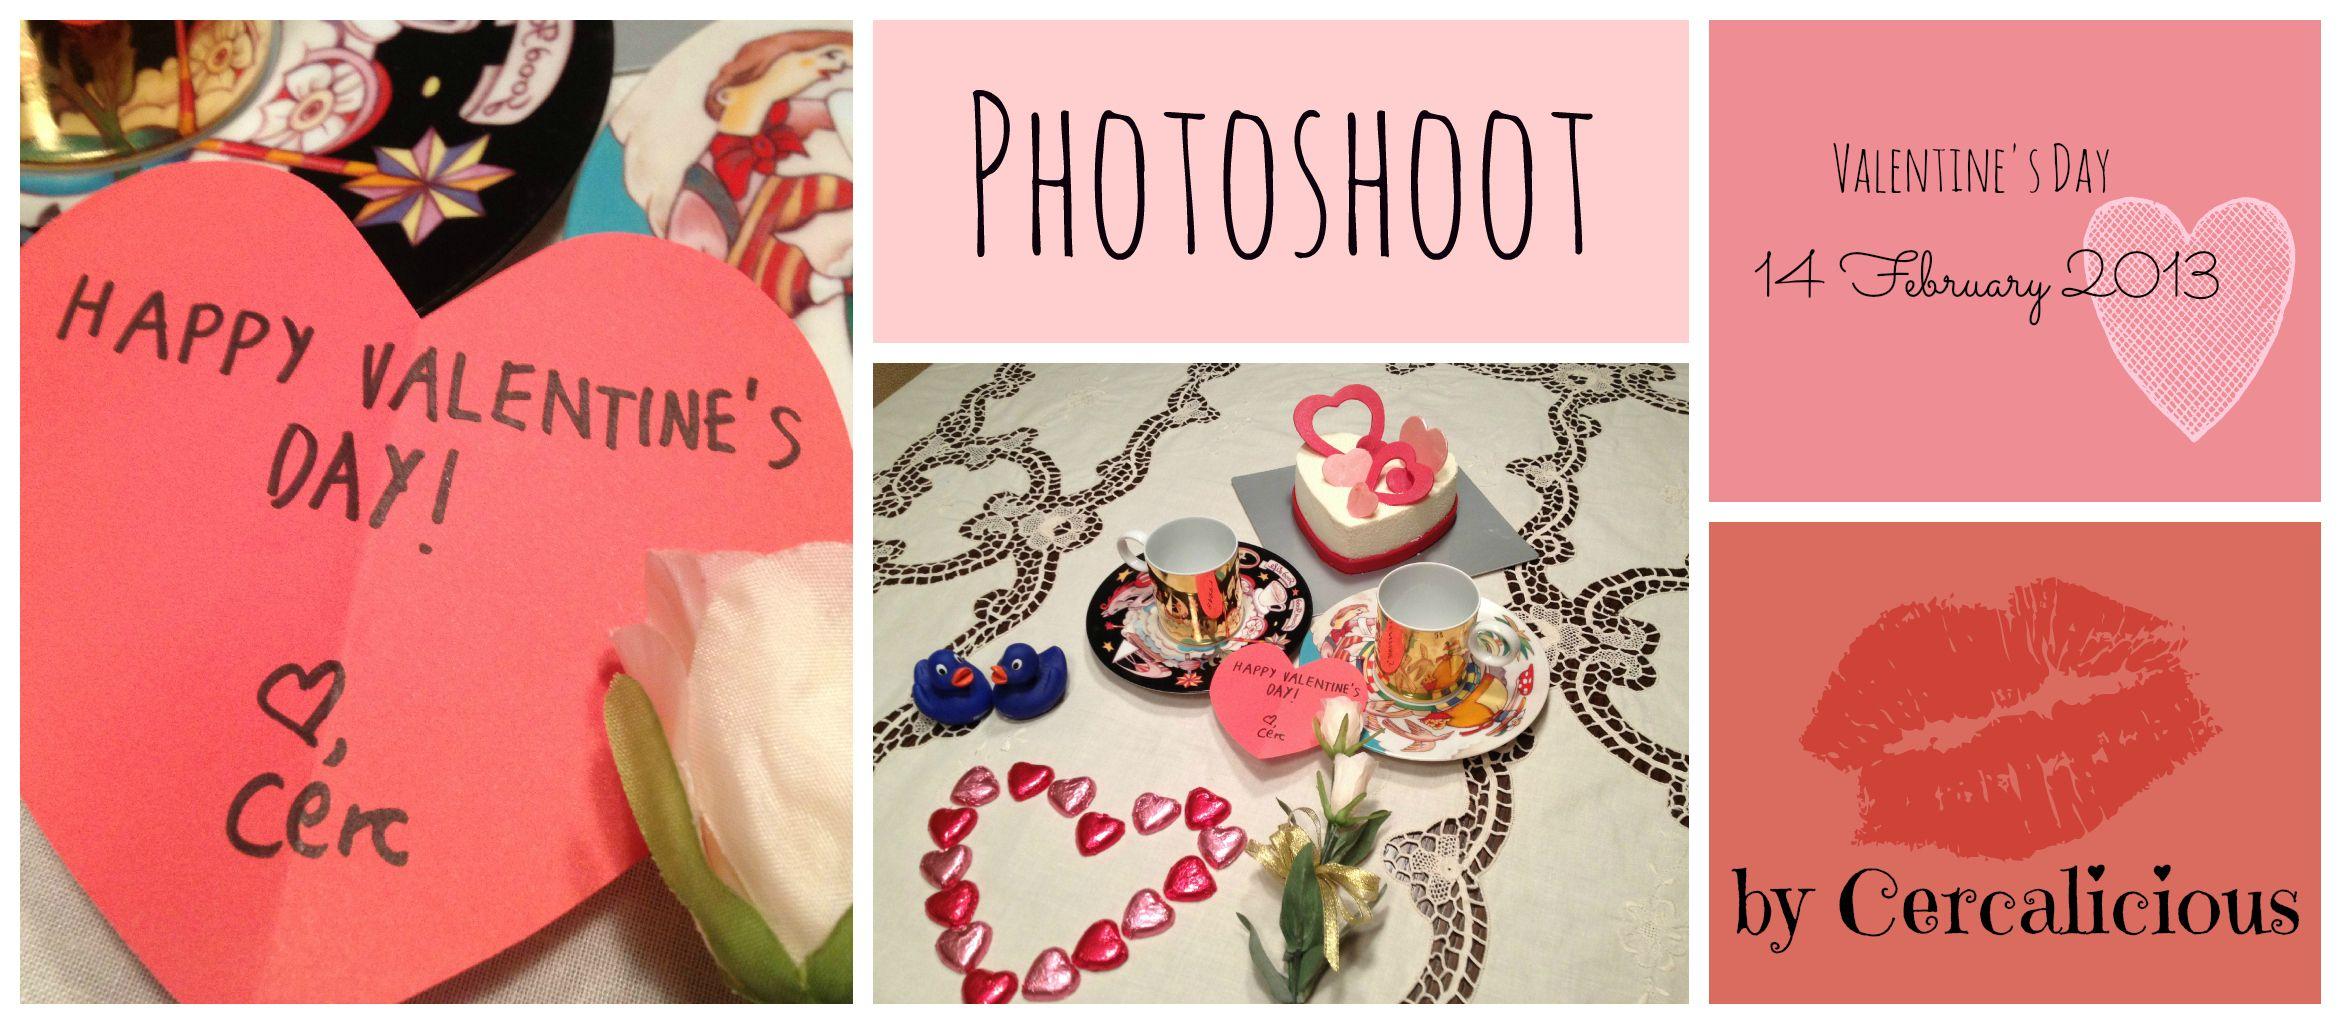 Valentine's Day Photoshoot + Original Poem!